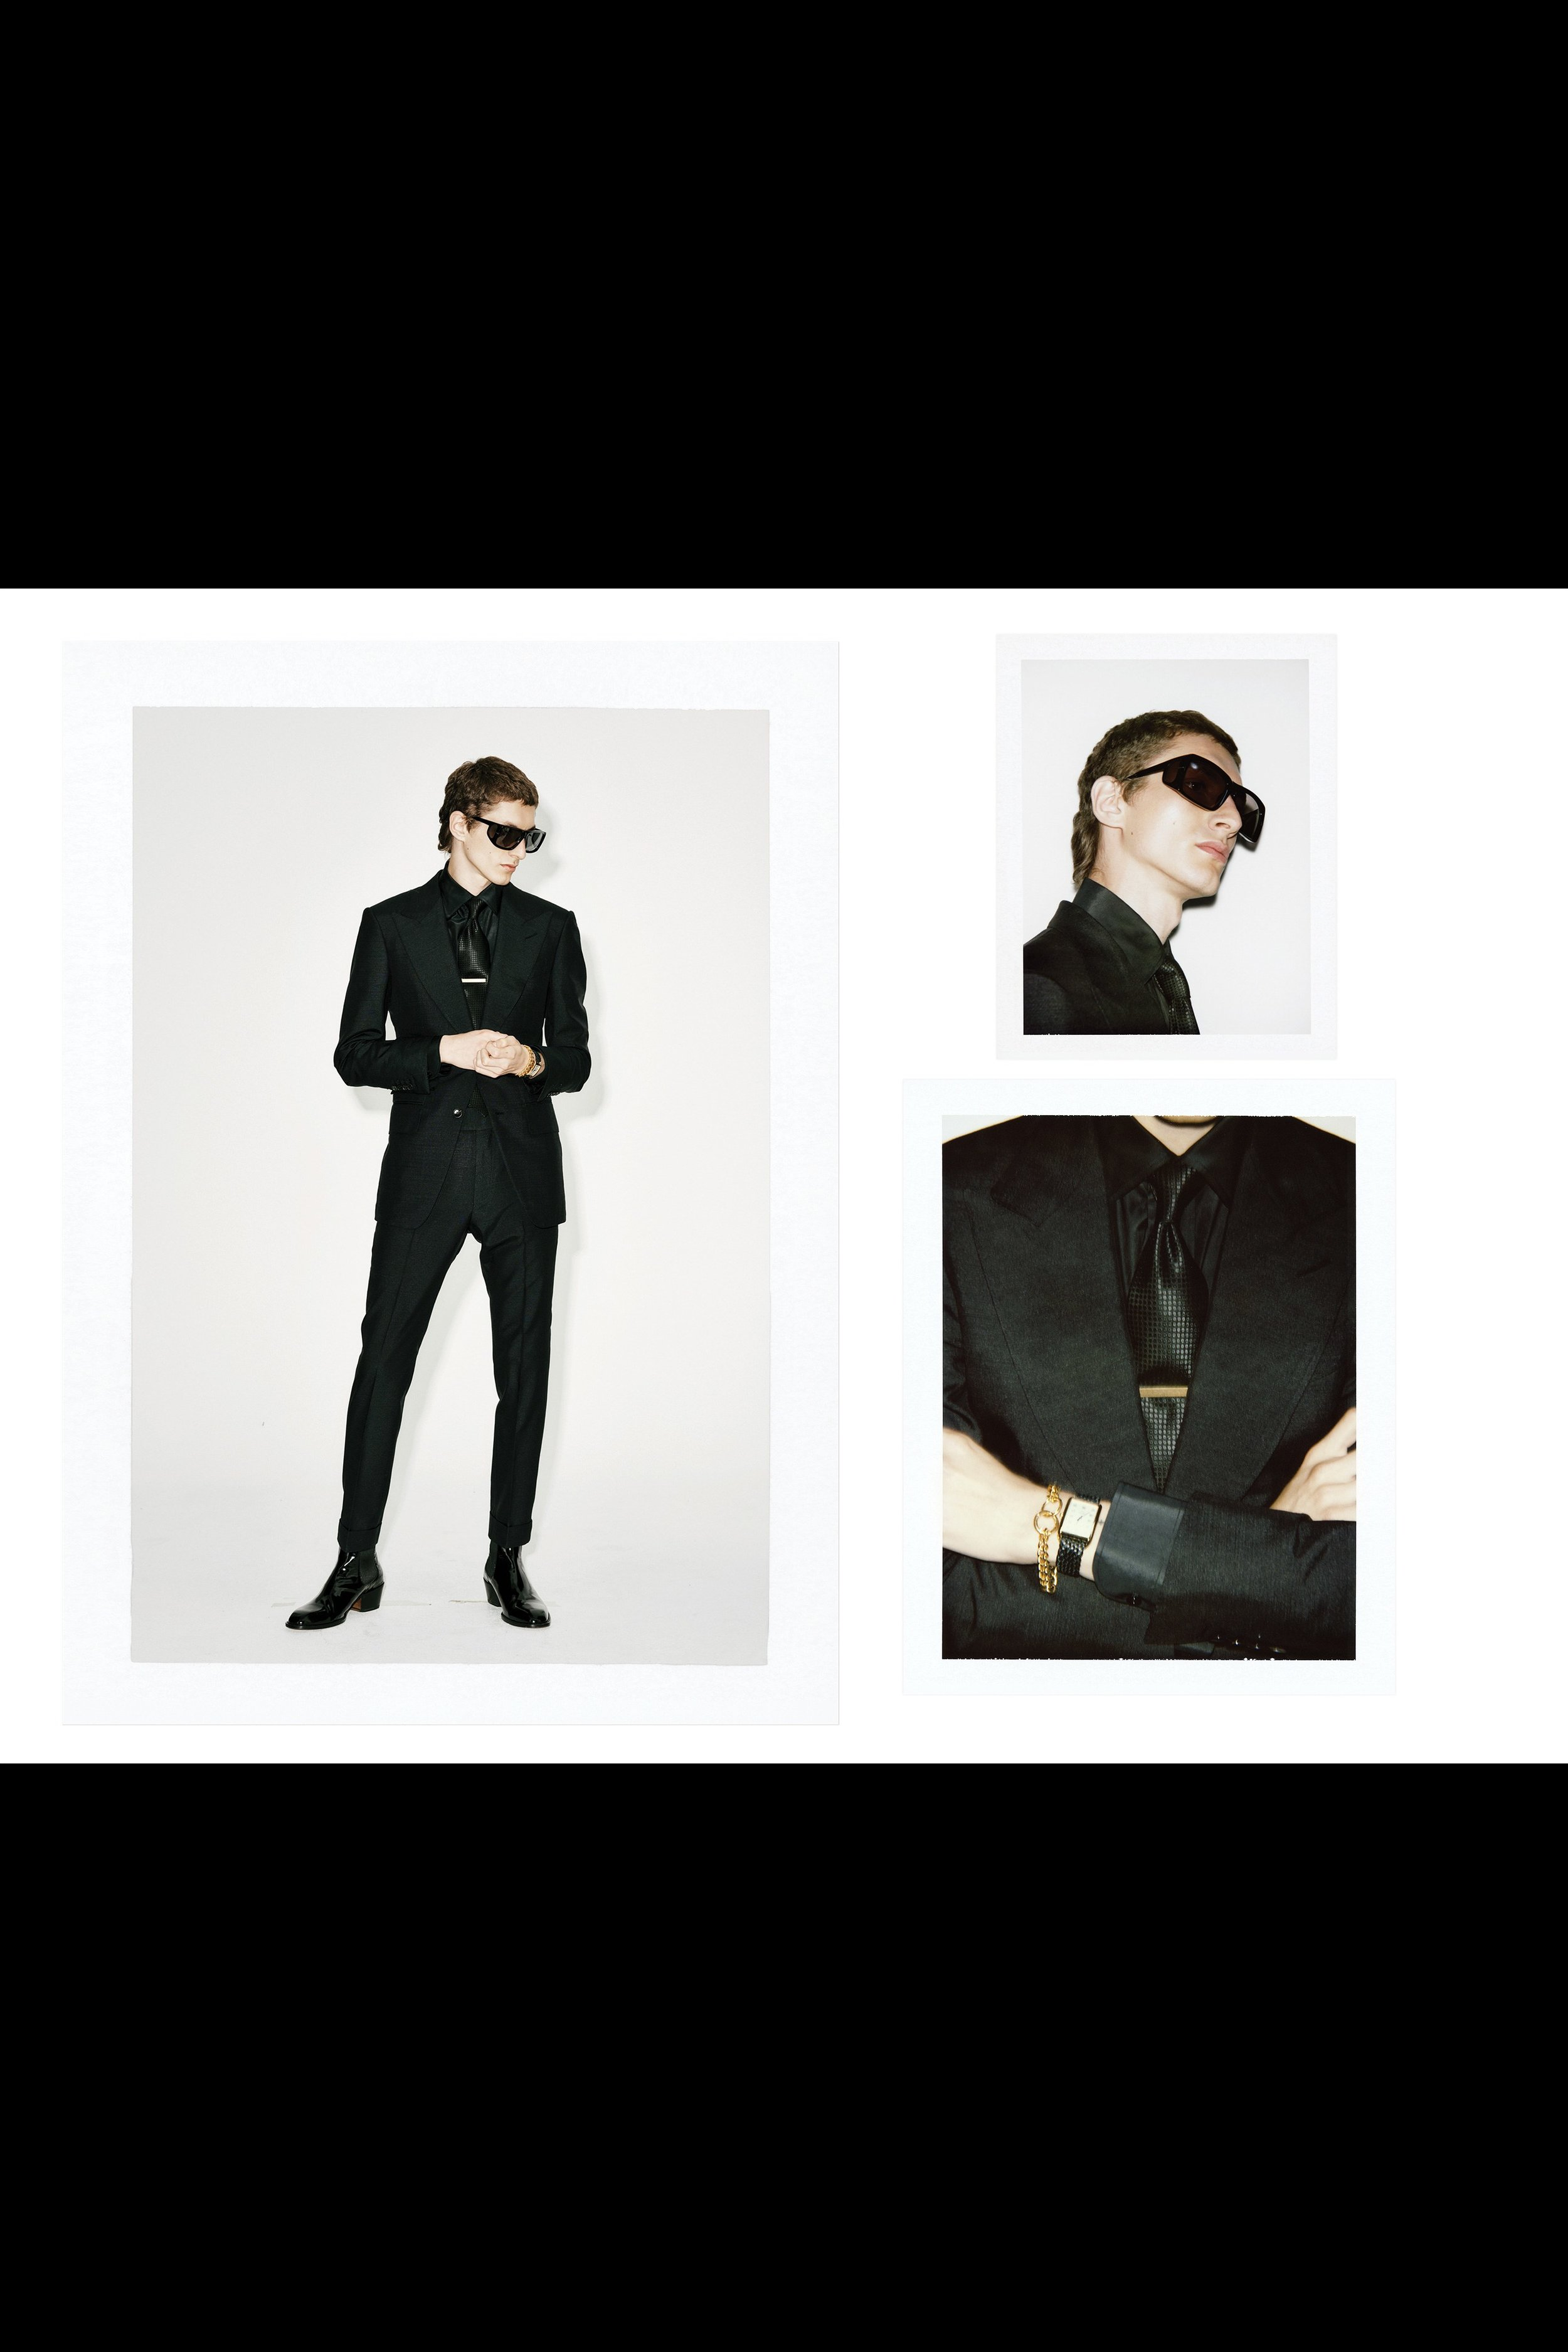 00004-Tom-Ford-vogue-menswear-spring-2019-pr.jpg